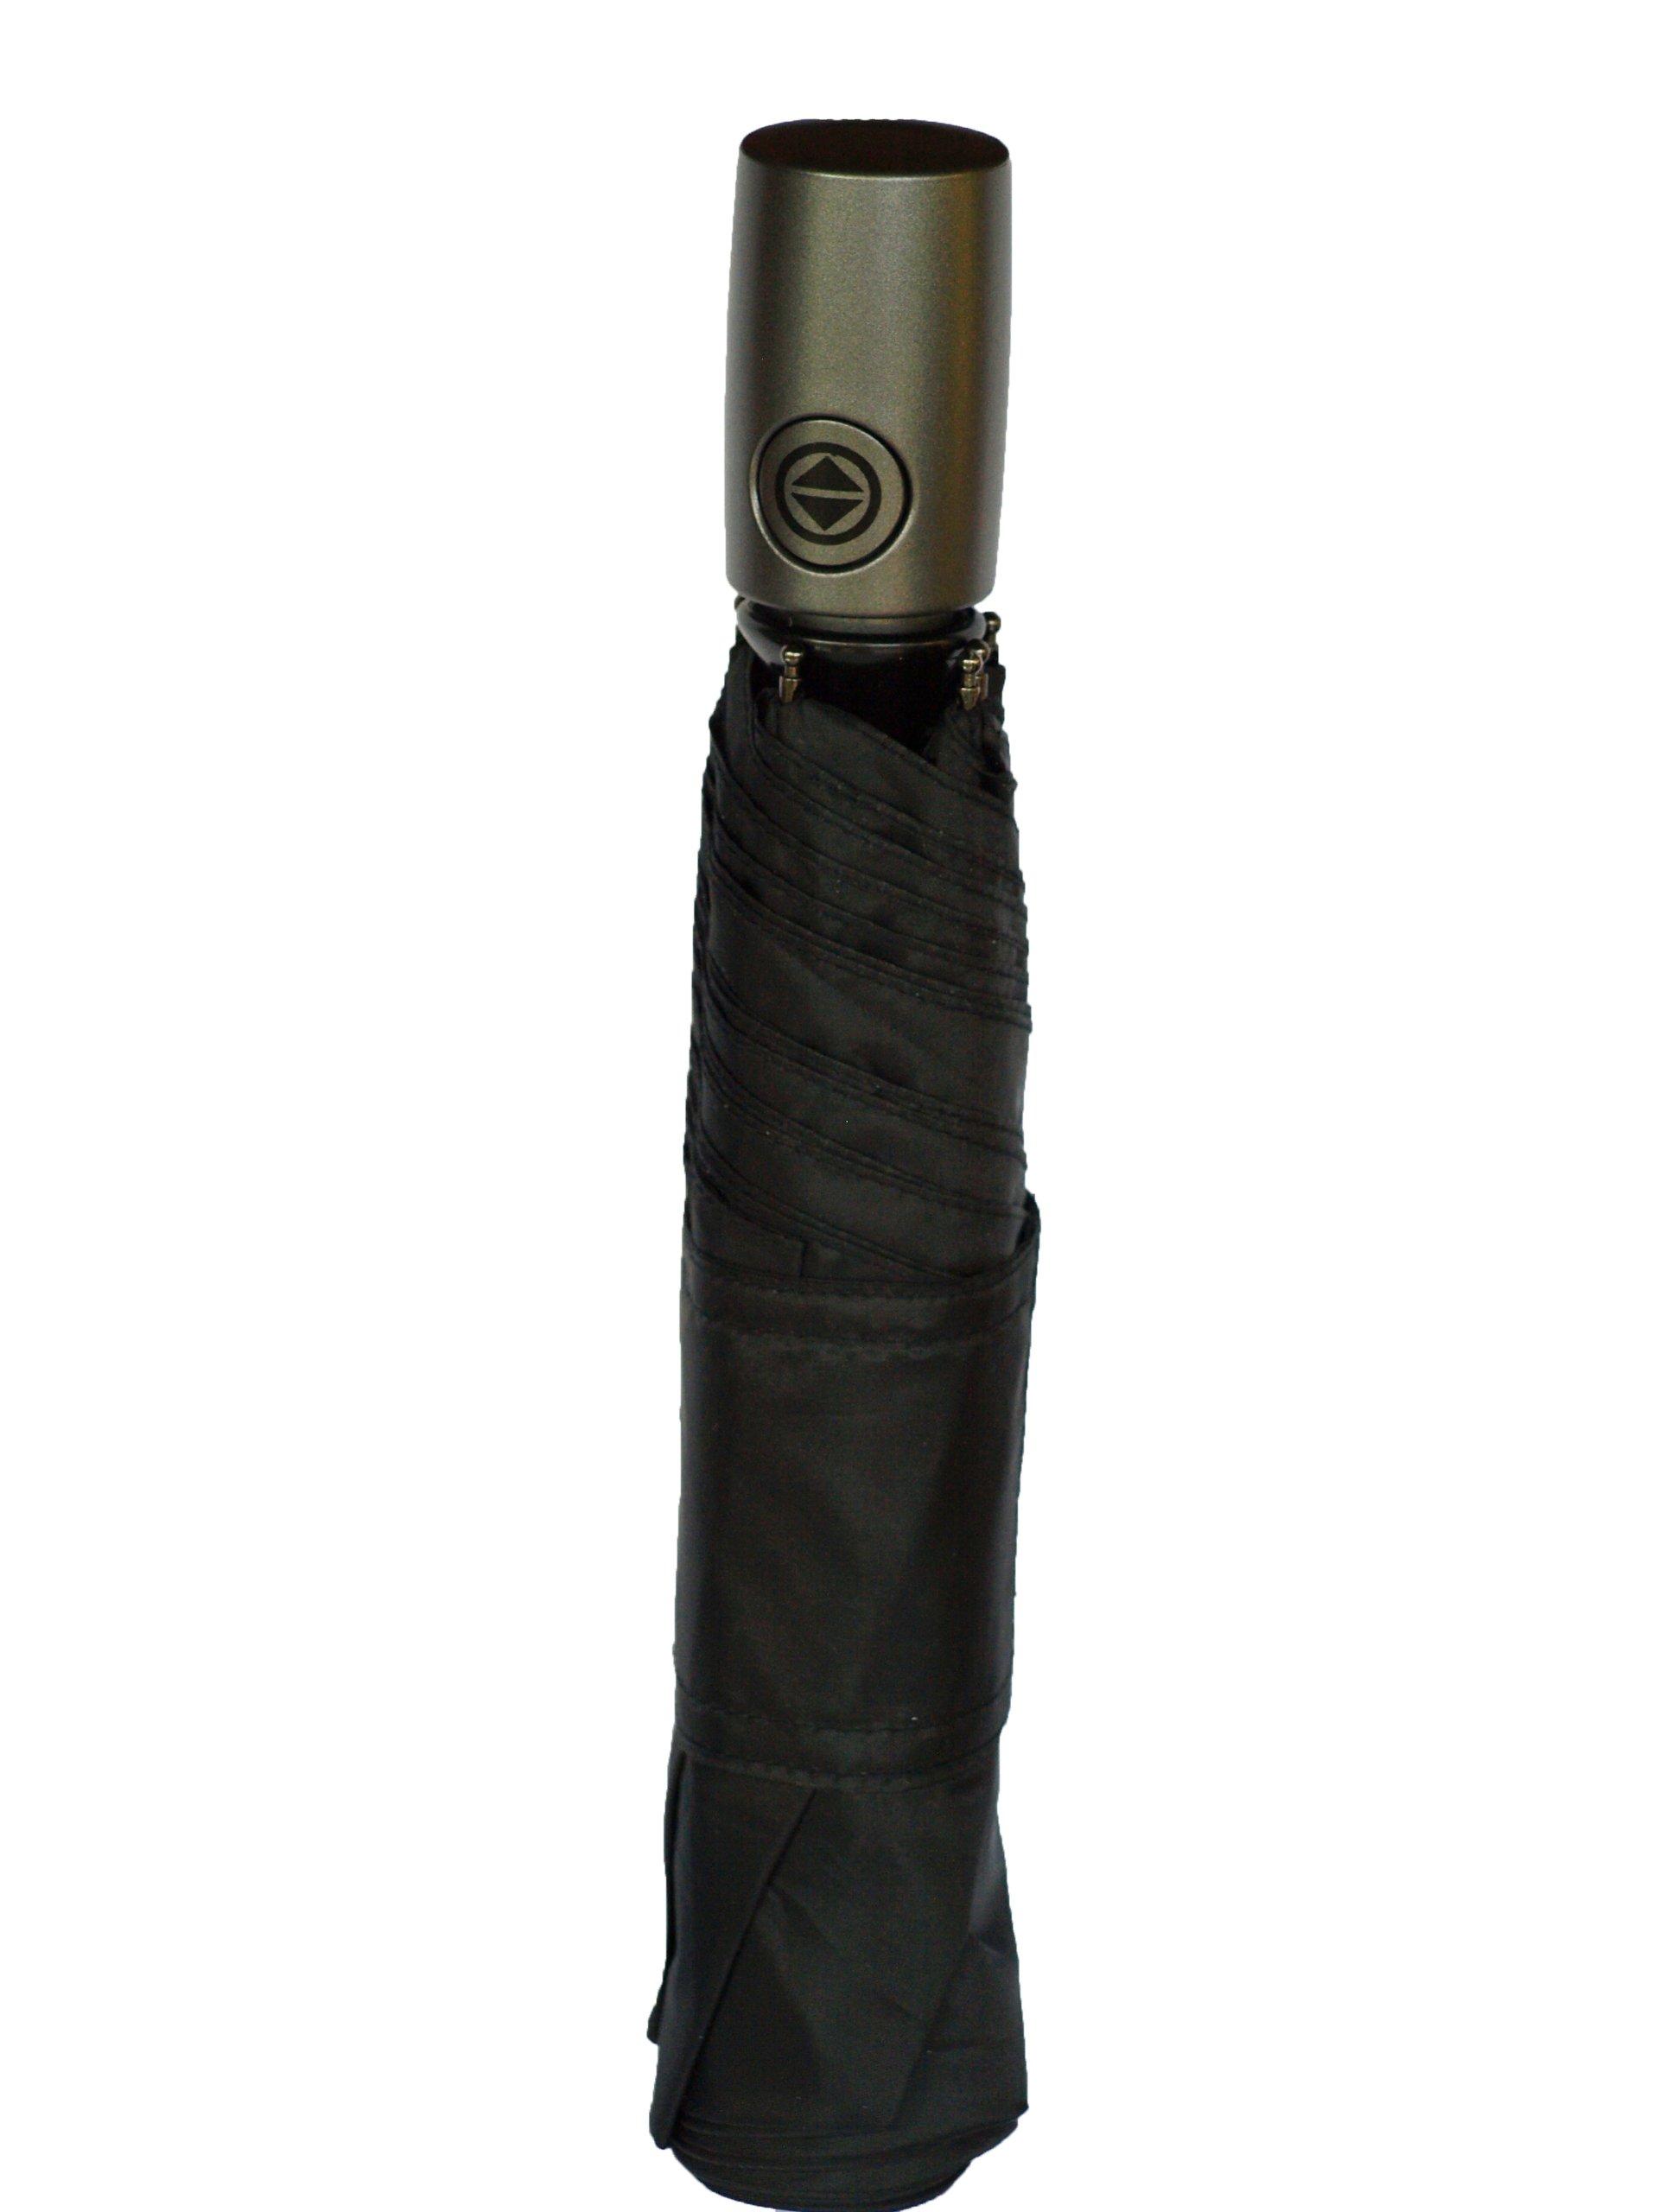 Totes Auto Open Auto Close Umbrella w/ Grey Handle (Black)